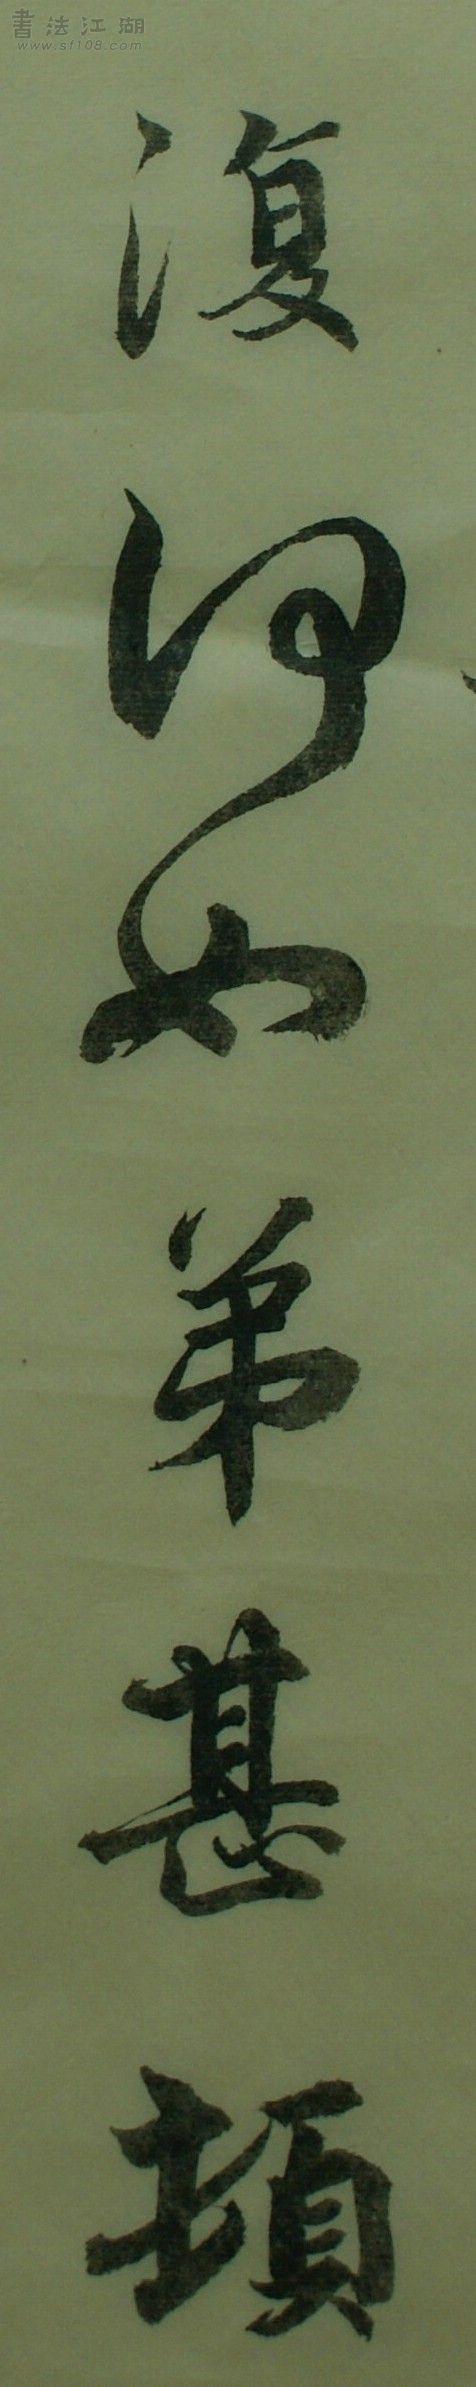 DSC04180.JPG